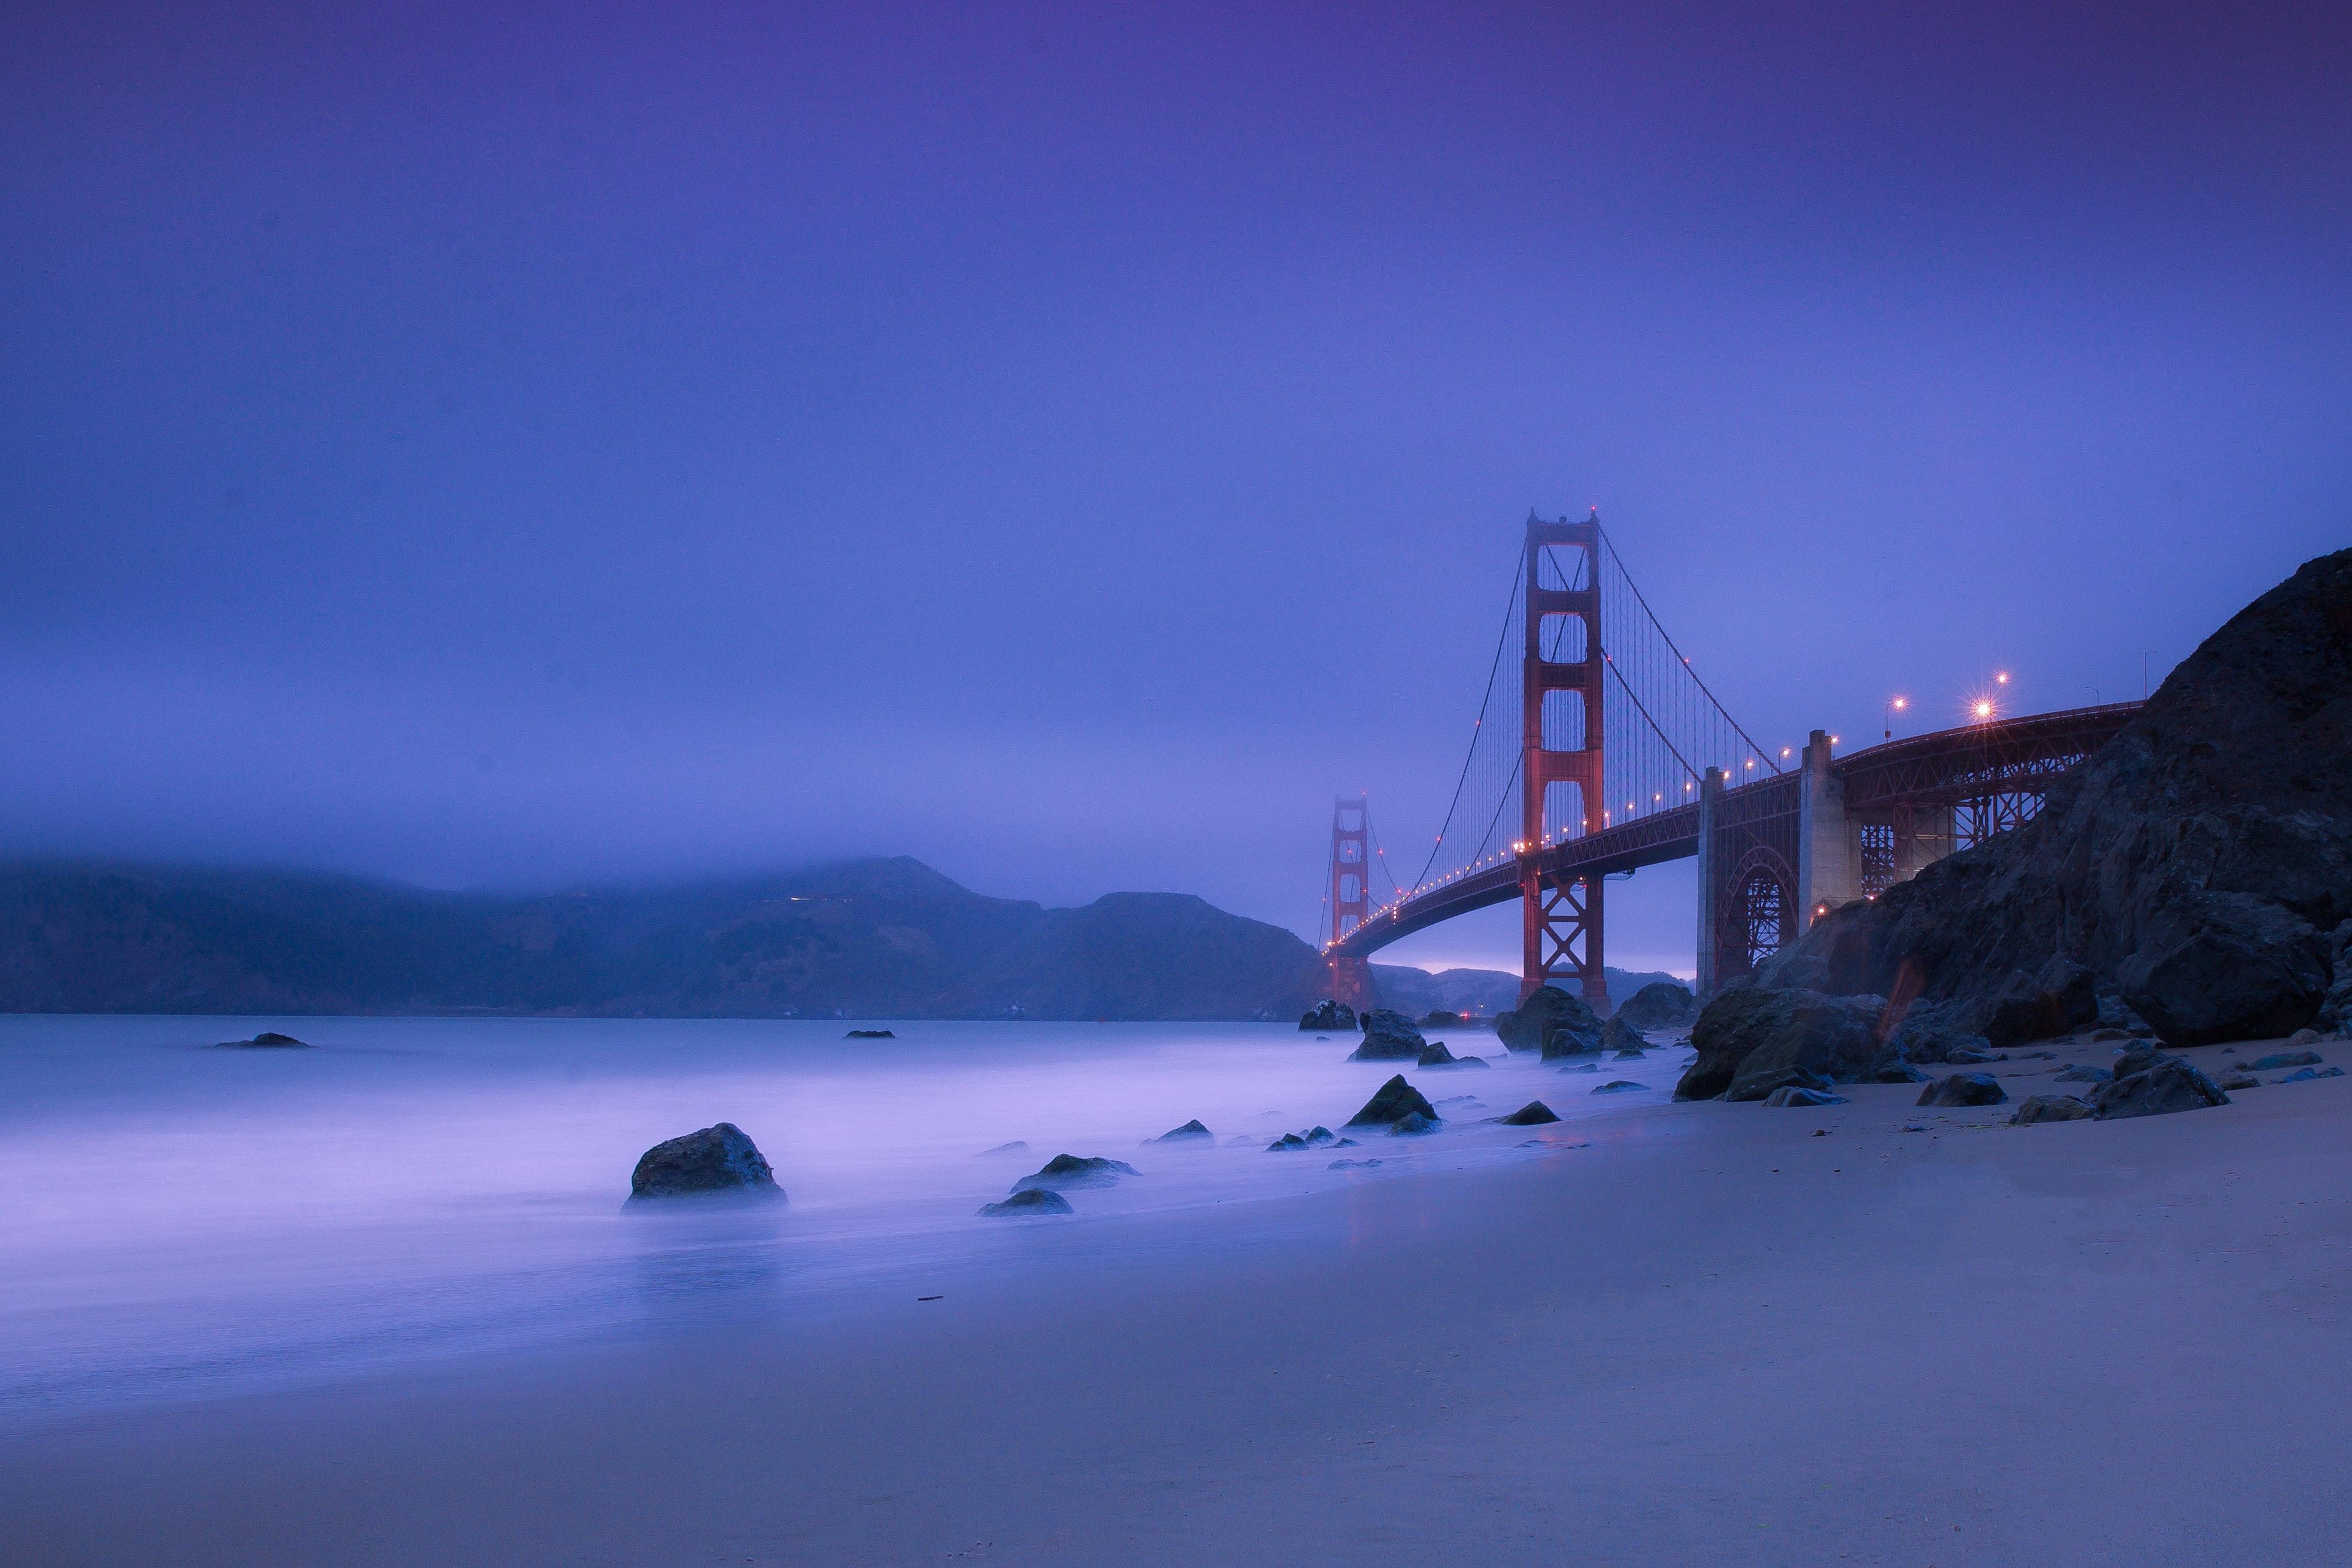 Golden Gate Bridge during Nighttime, Ocean, Winter, Water, Travel, HQ Photo